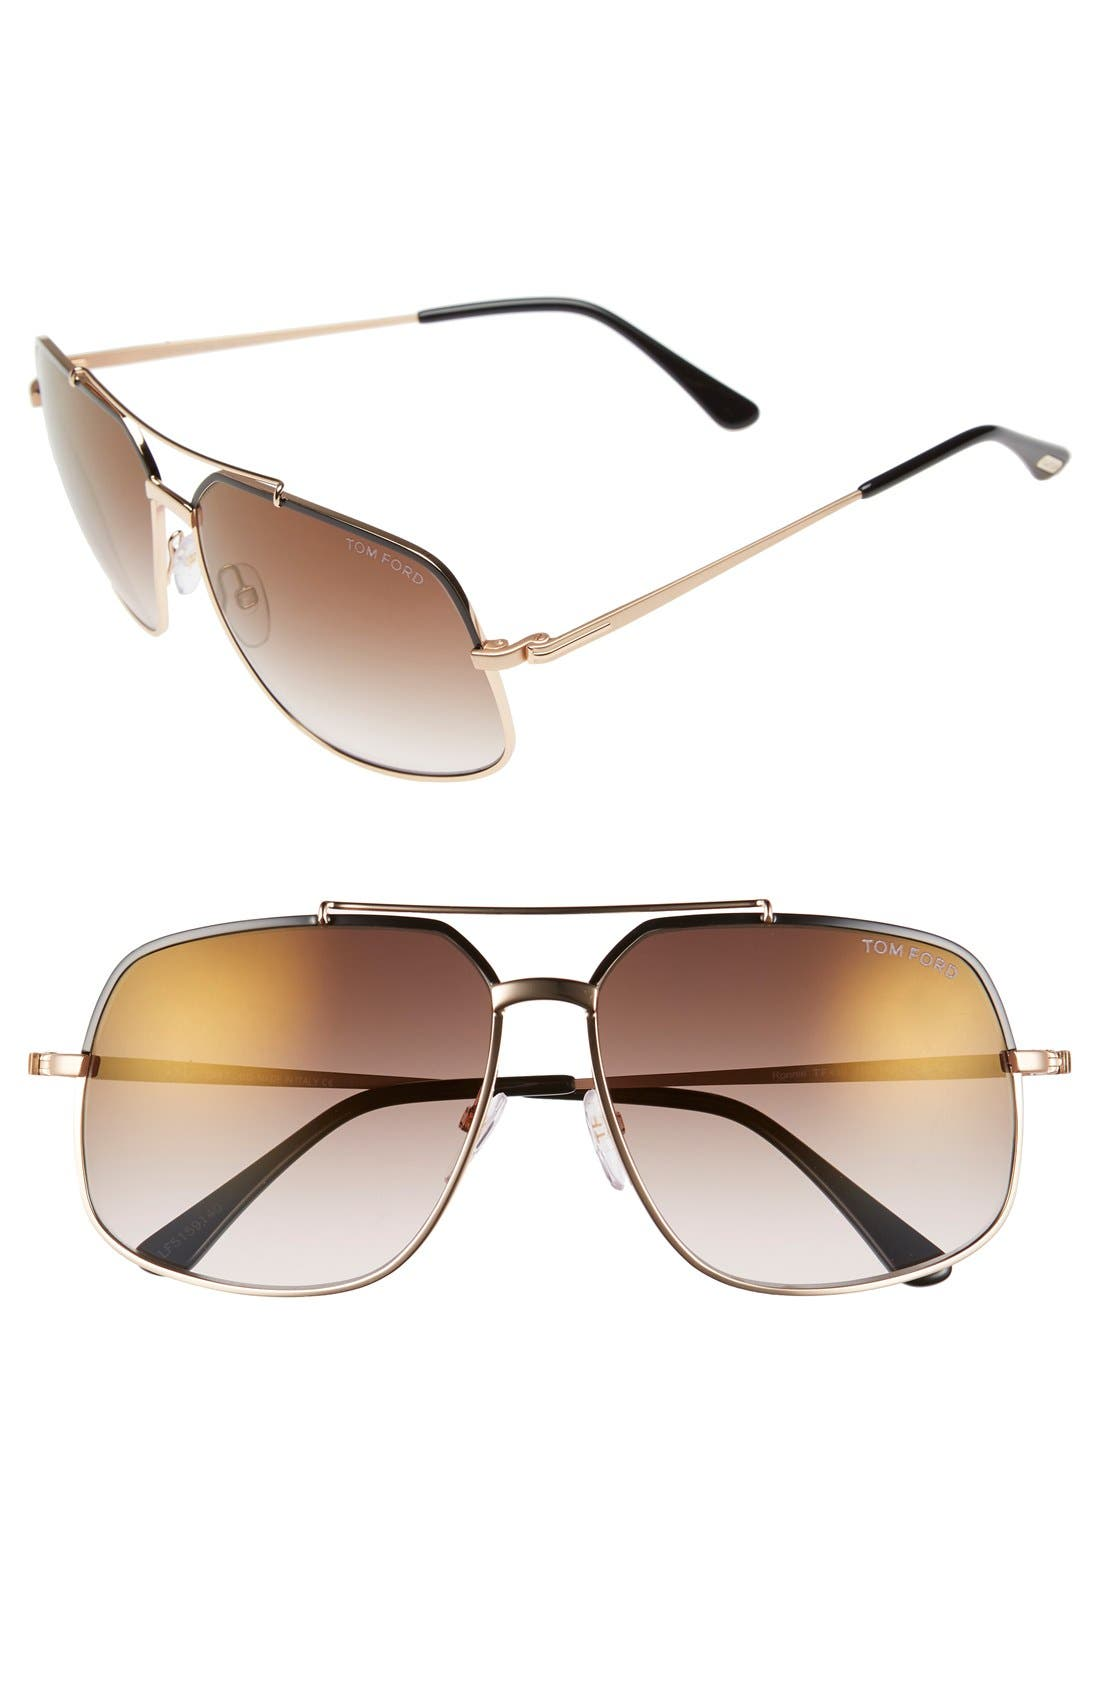 'Ronnie' 60mm Aviator Sunglasses,                             Main thumbnail 1, color,                             Shiny Black/ Brown Mirror